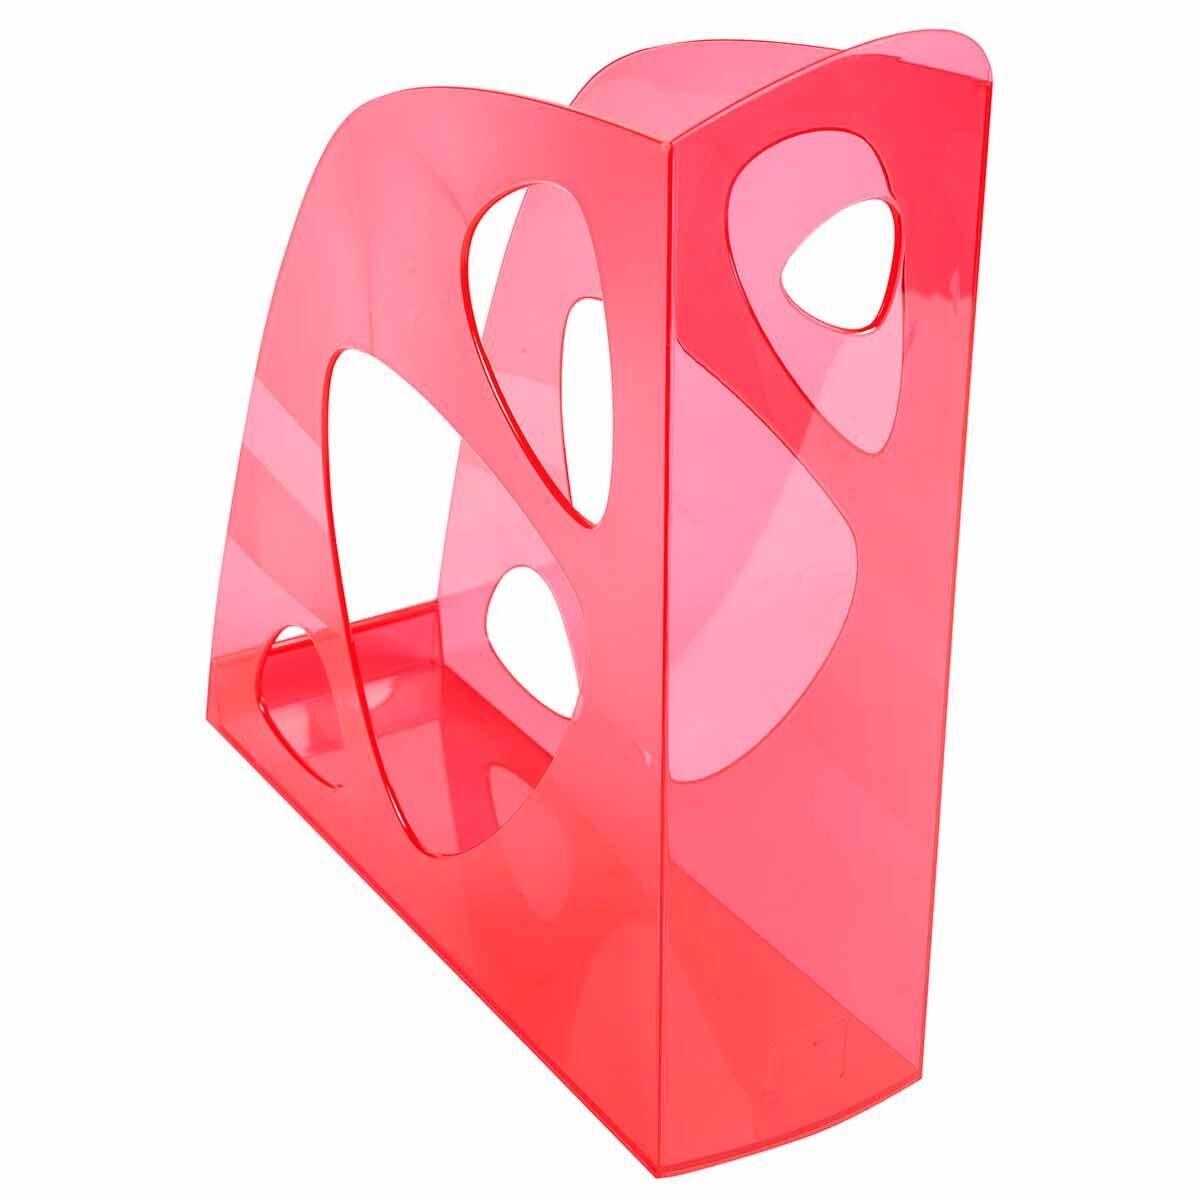 Exacompta ECOMAG Magazine File Pack of 10 Raspberry Pink